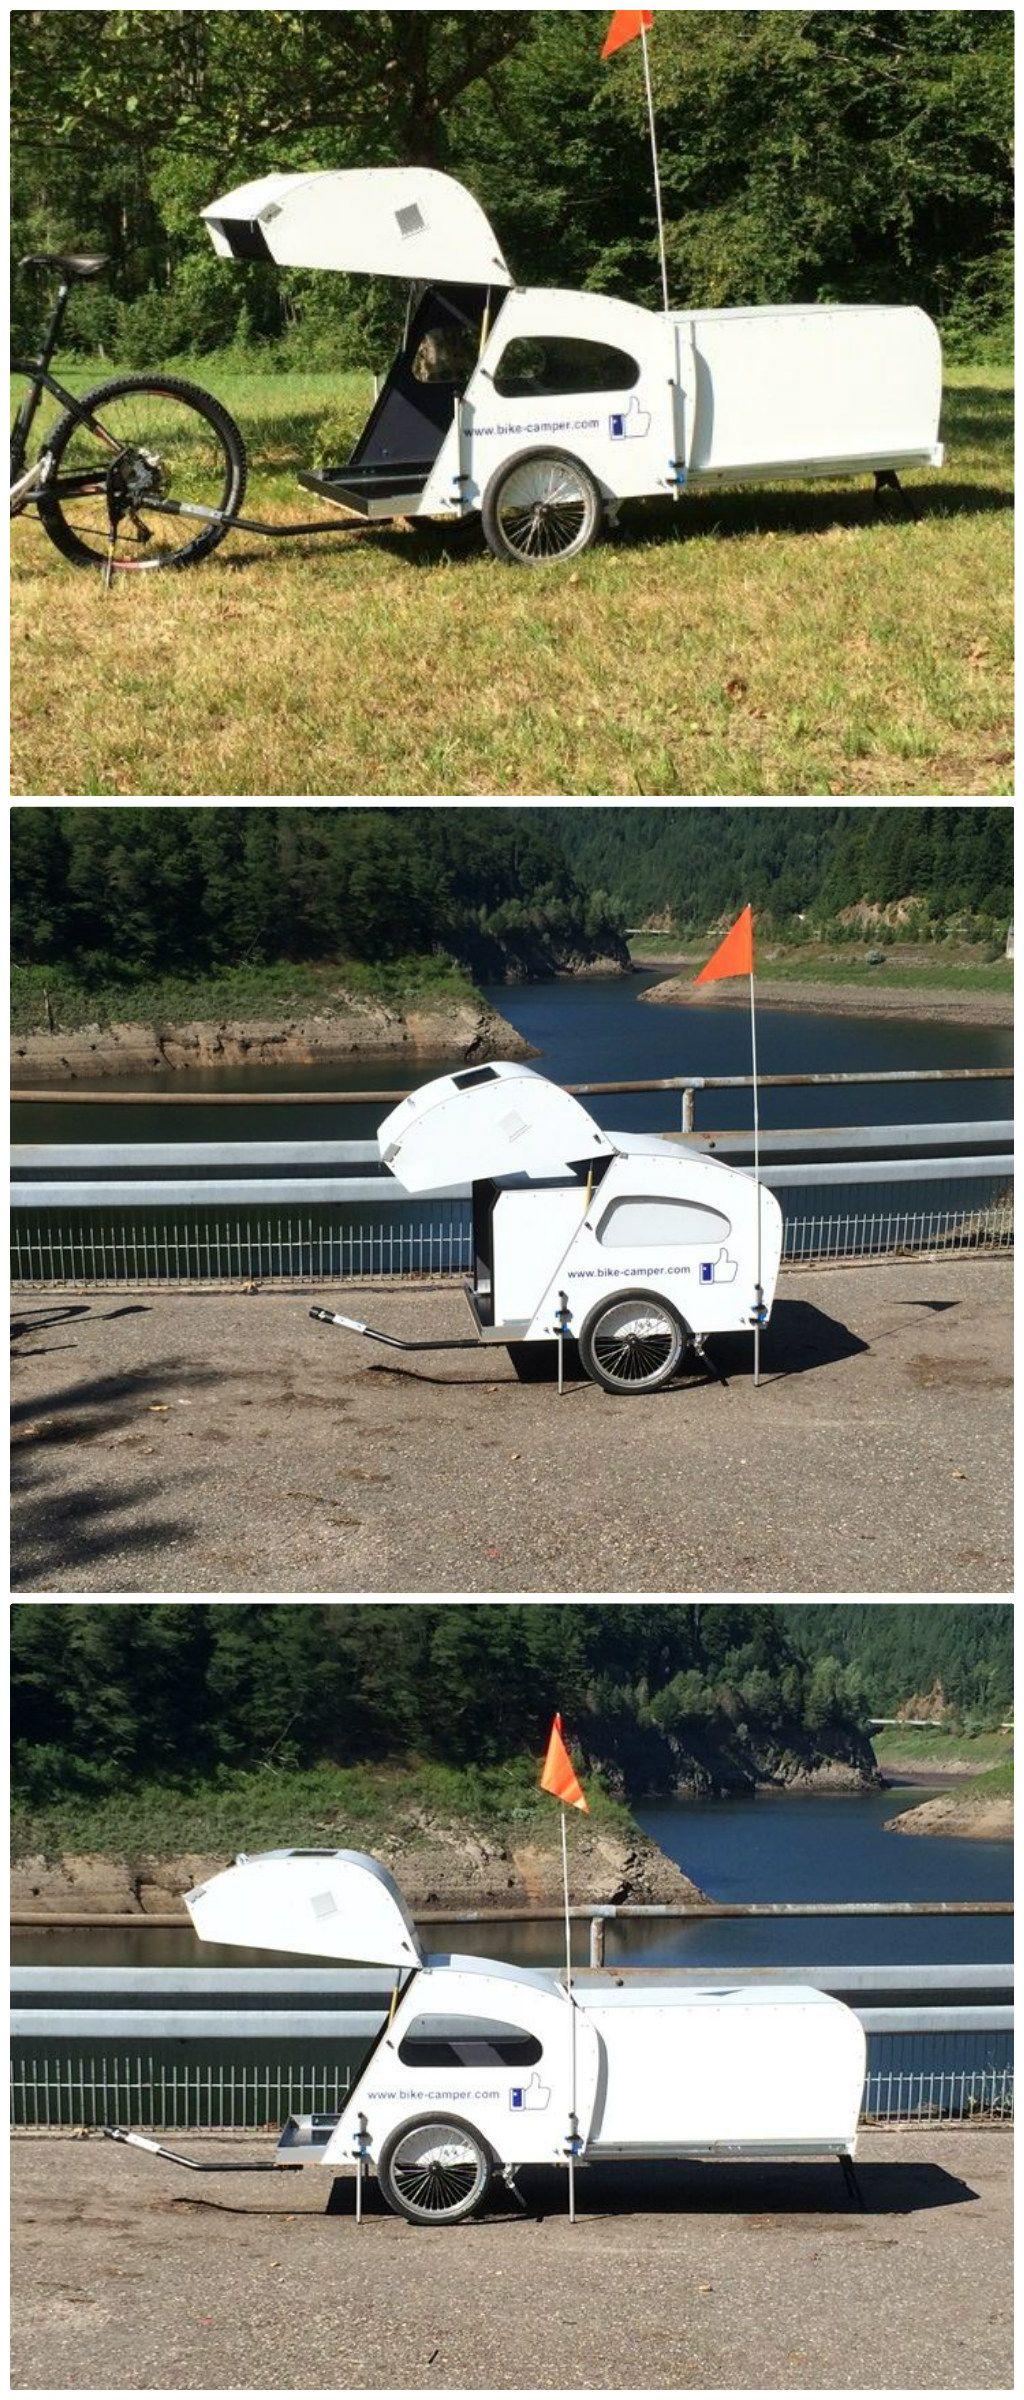 Bike-camper with extendable rear pod | Fahrrad | Pinterest ...